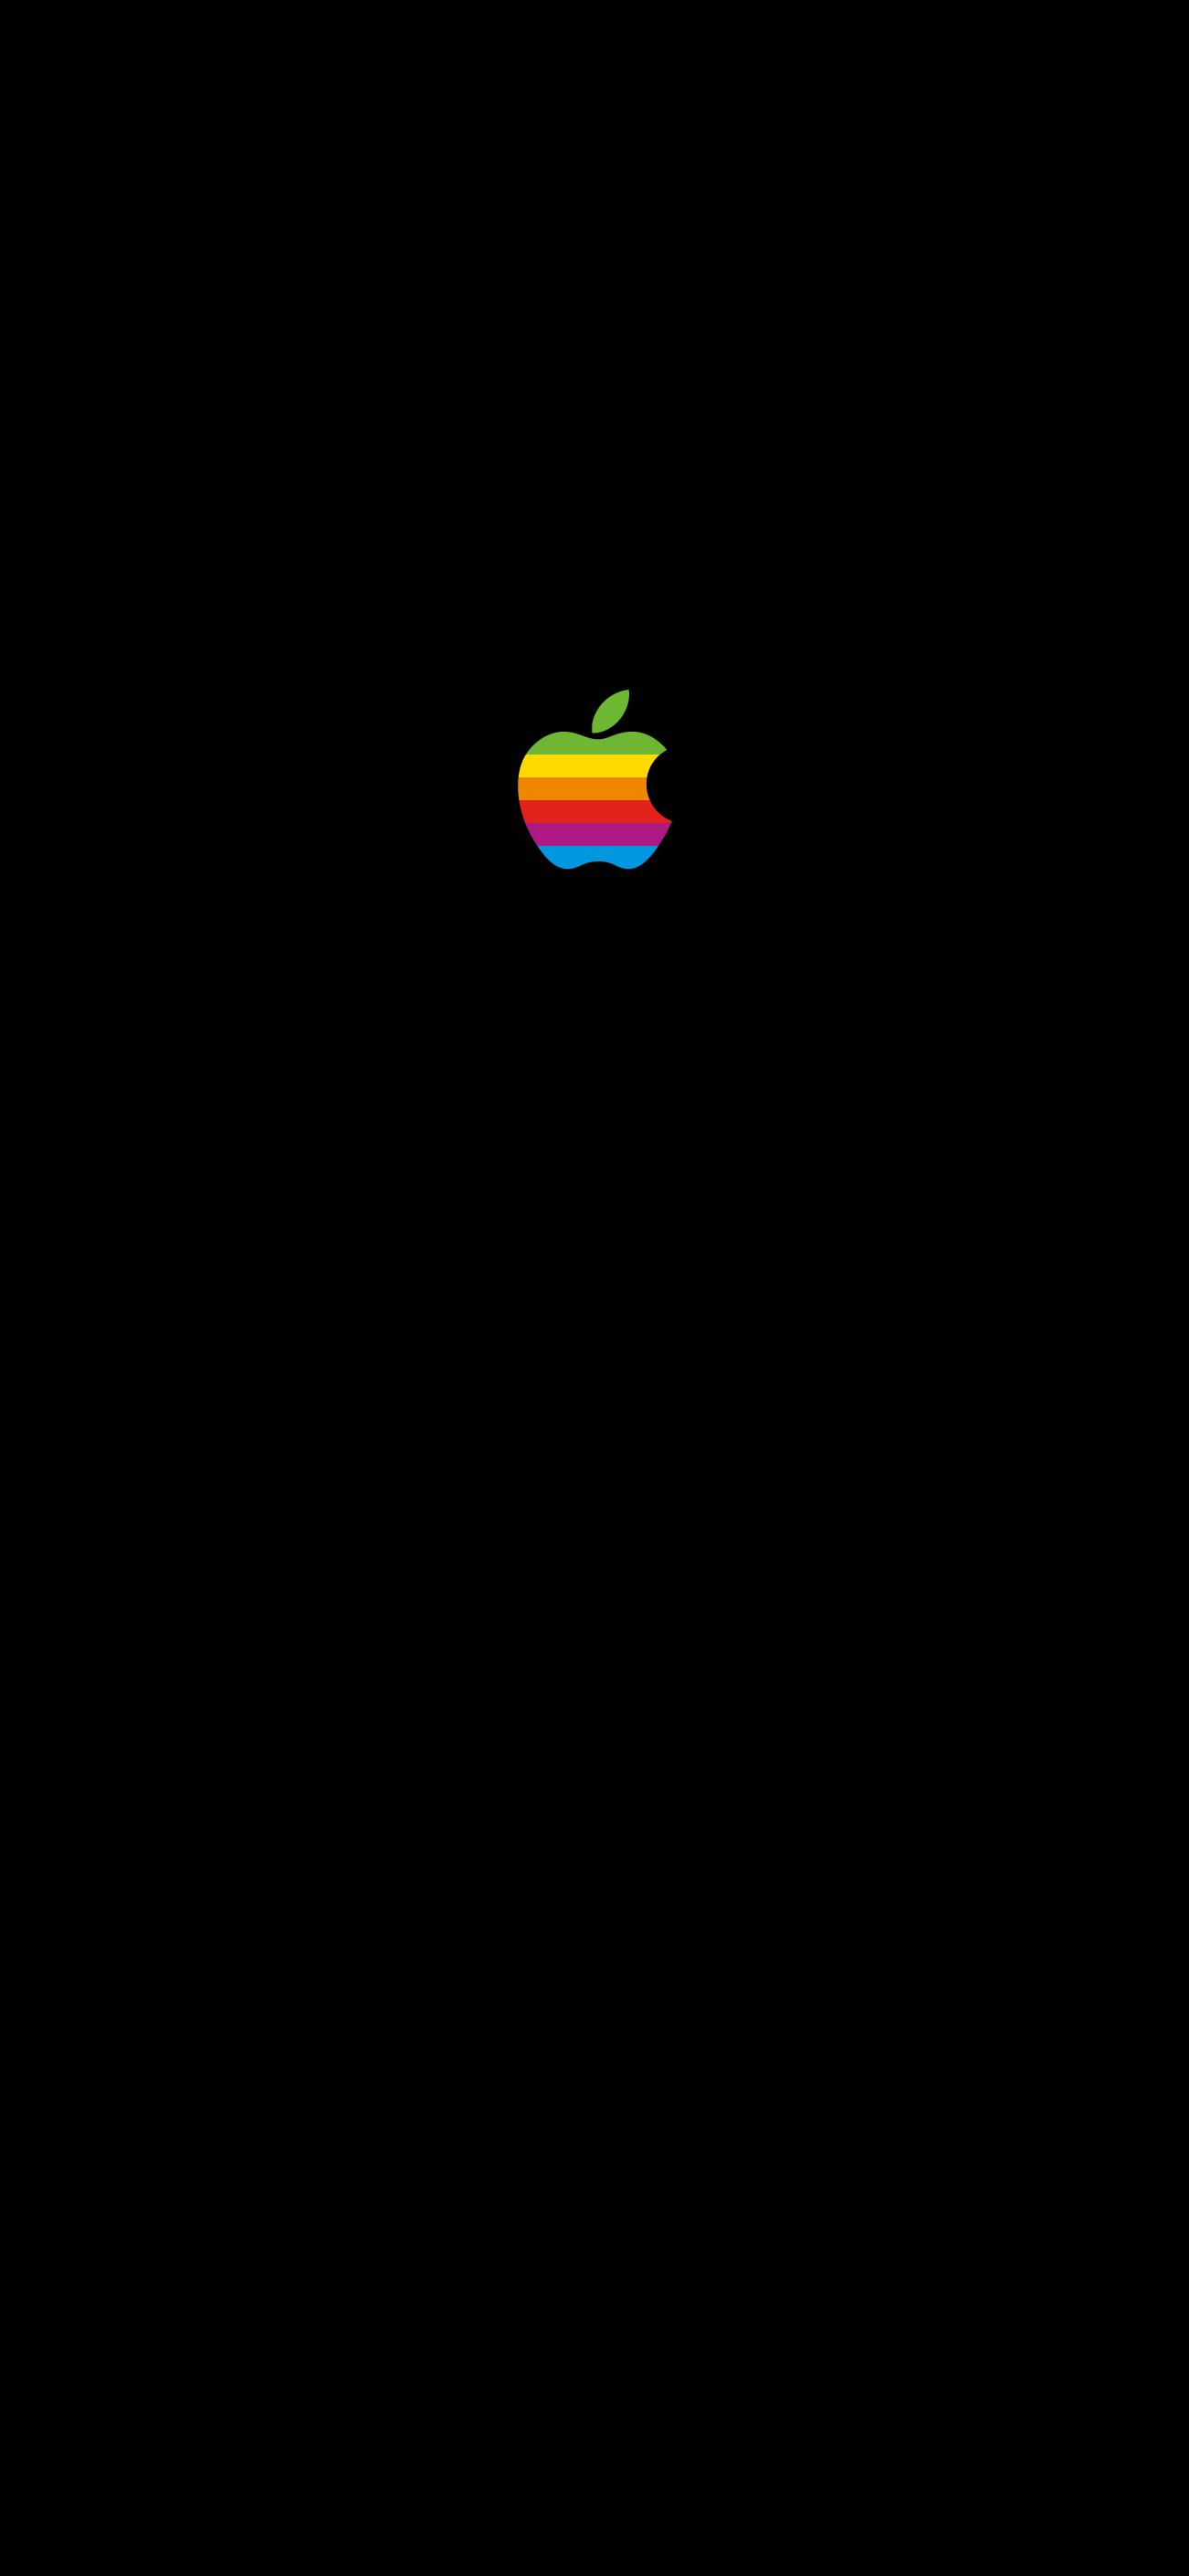 Appleレインボー壁紙 iPhone X (1:2.165)